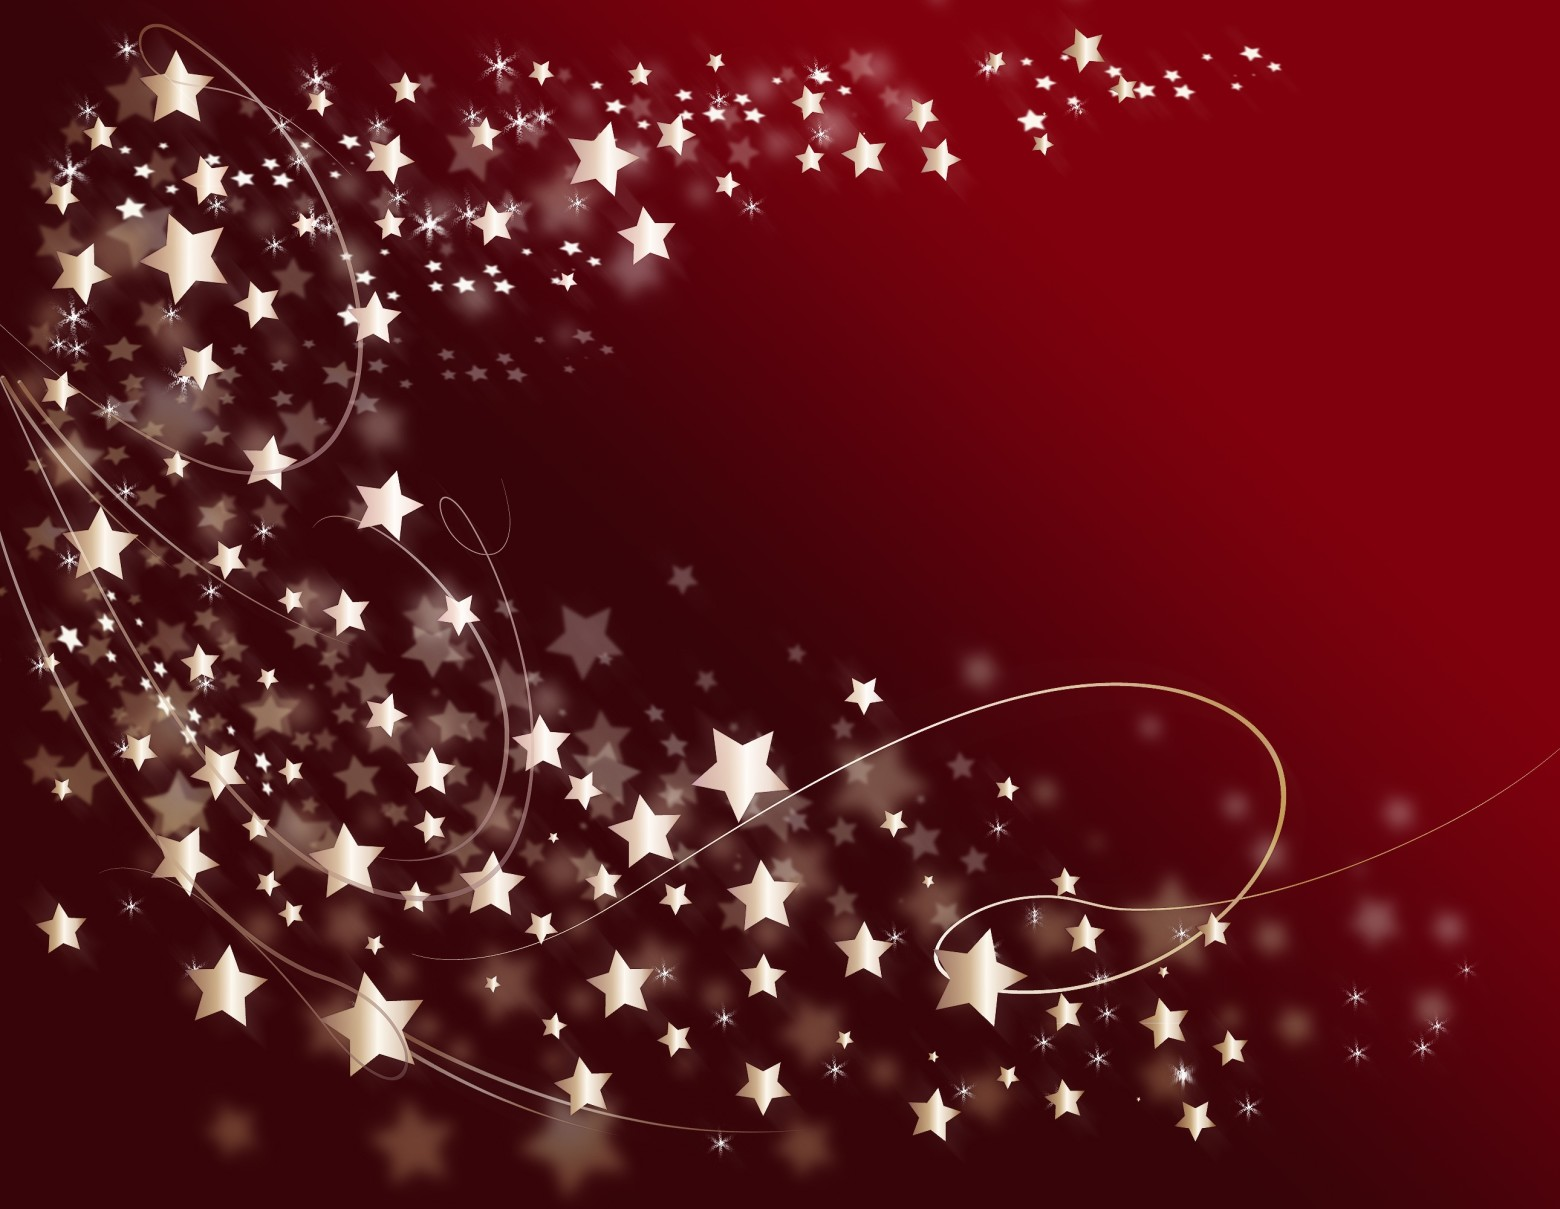 Background christmas noel images de fond gratuites - Boules de noel images gratuites ...